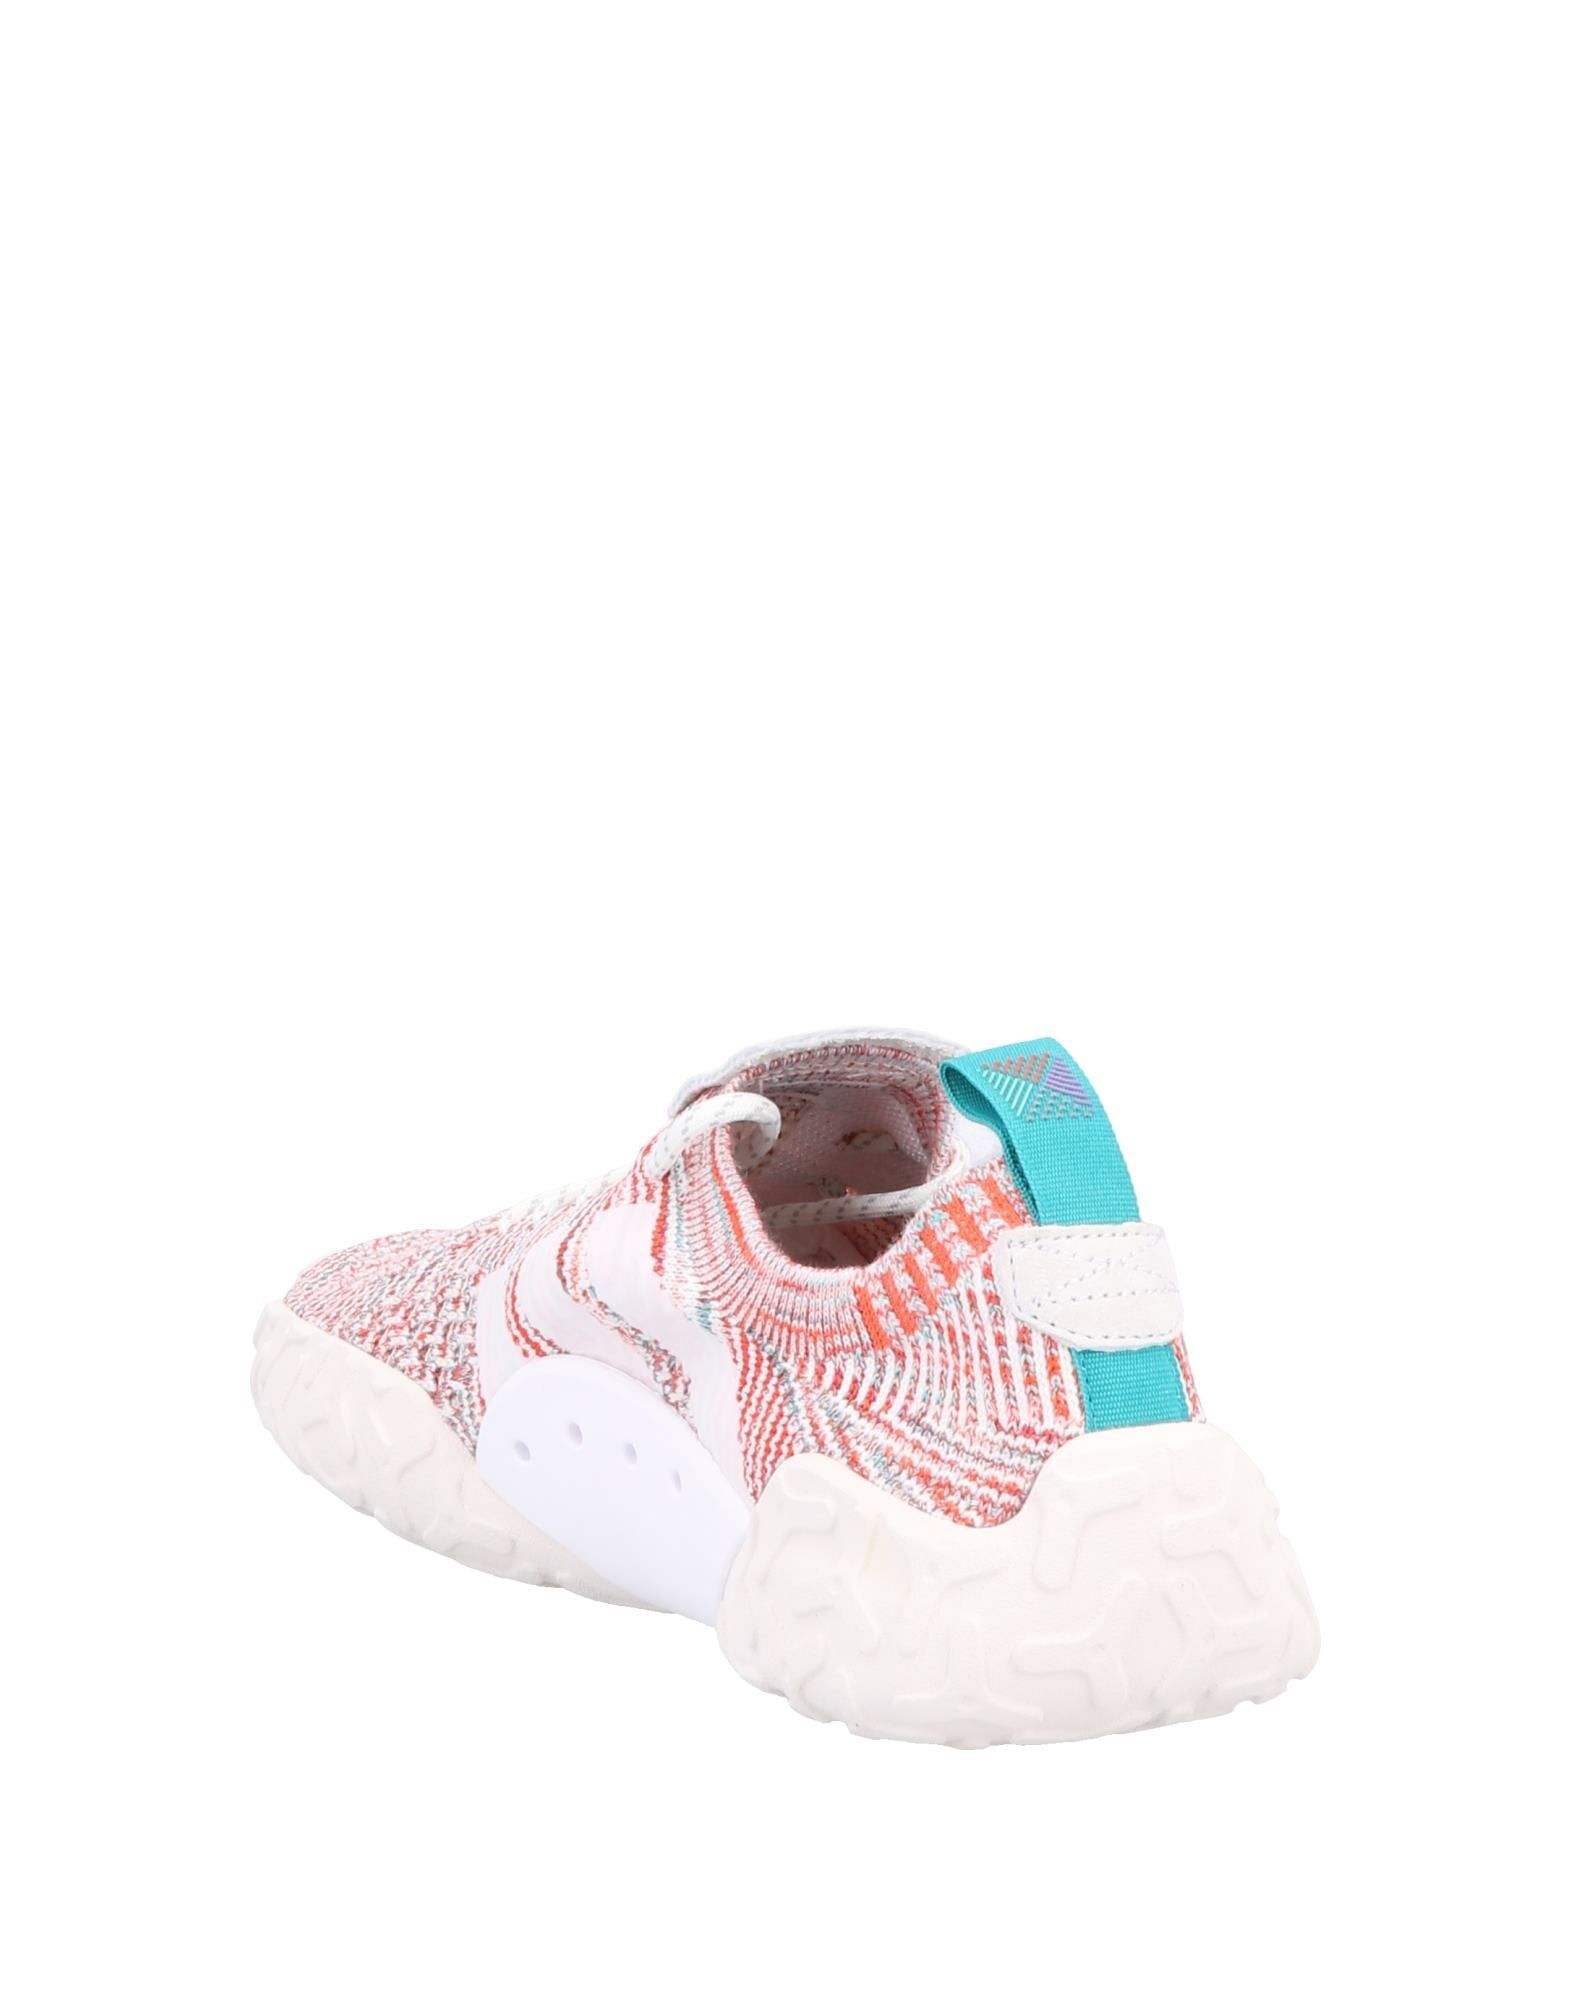 Rabatt Turnschuhes echte Schuhe Adidas Originals Turnschuhes Rabatt Herren 11568382WT e753ac